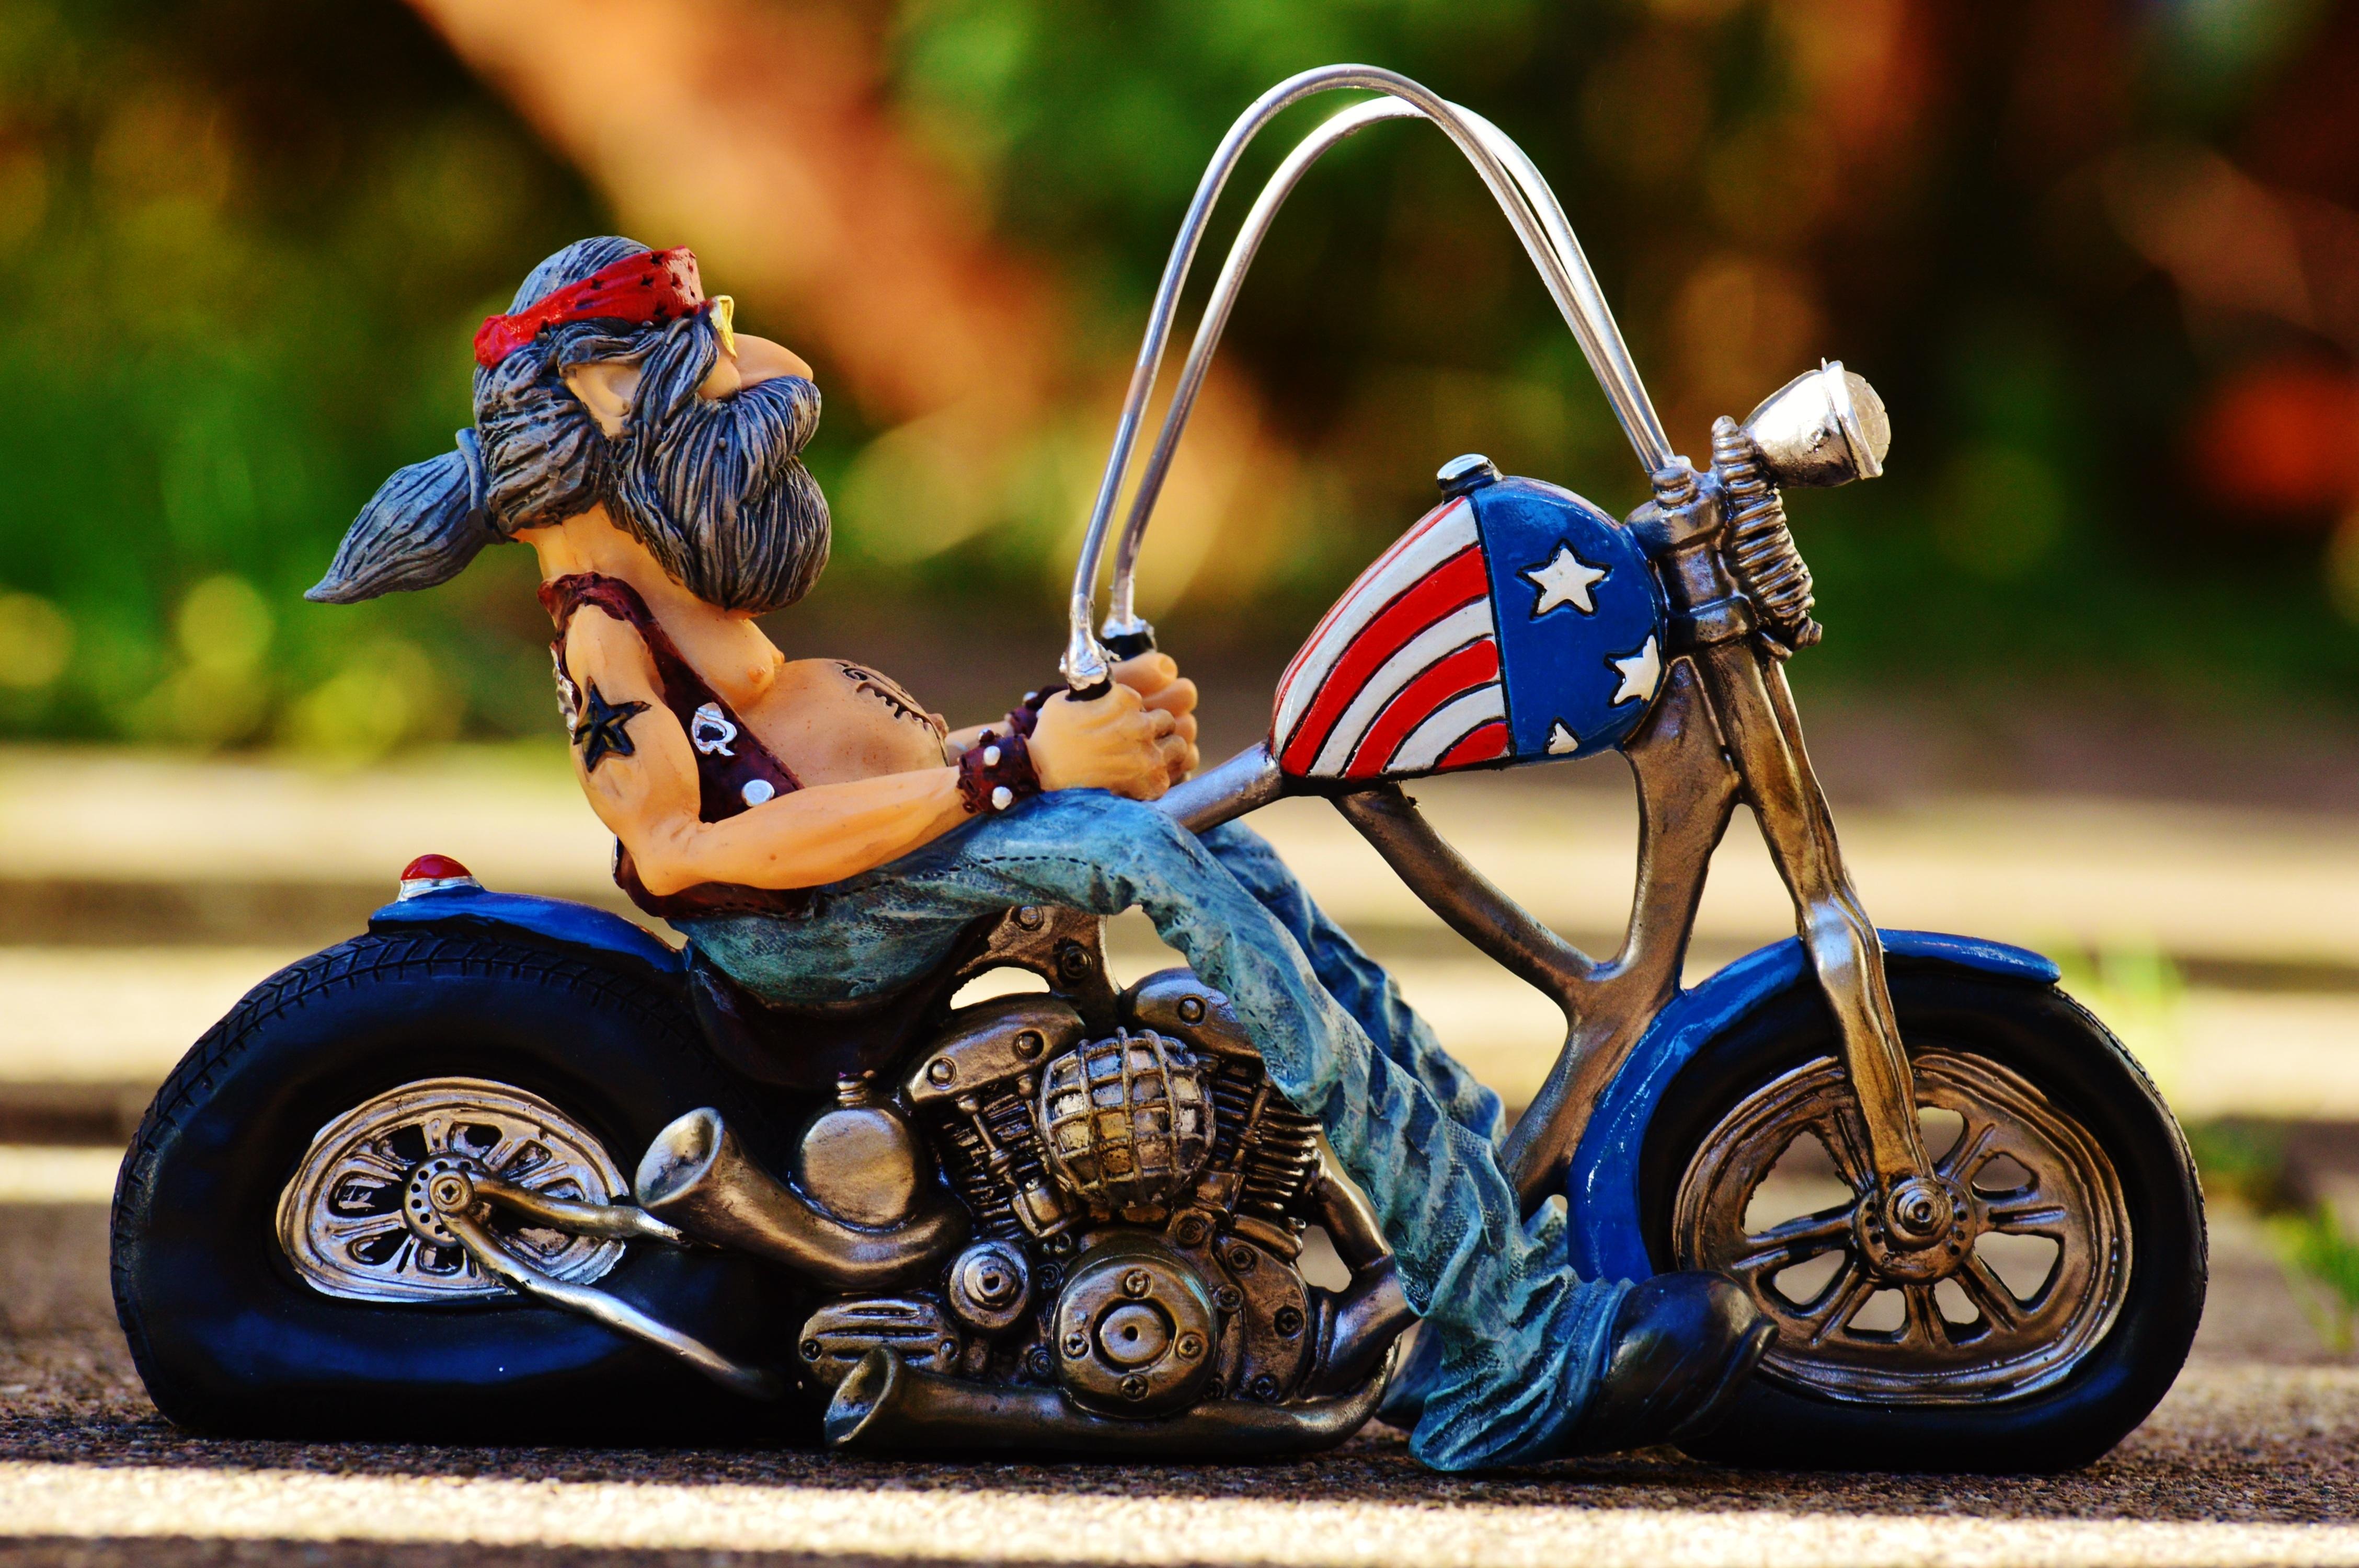 Gratis Billeder Mand Cykel Jeans Motorcykel Amerika